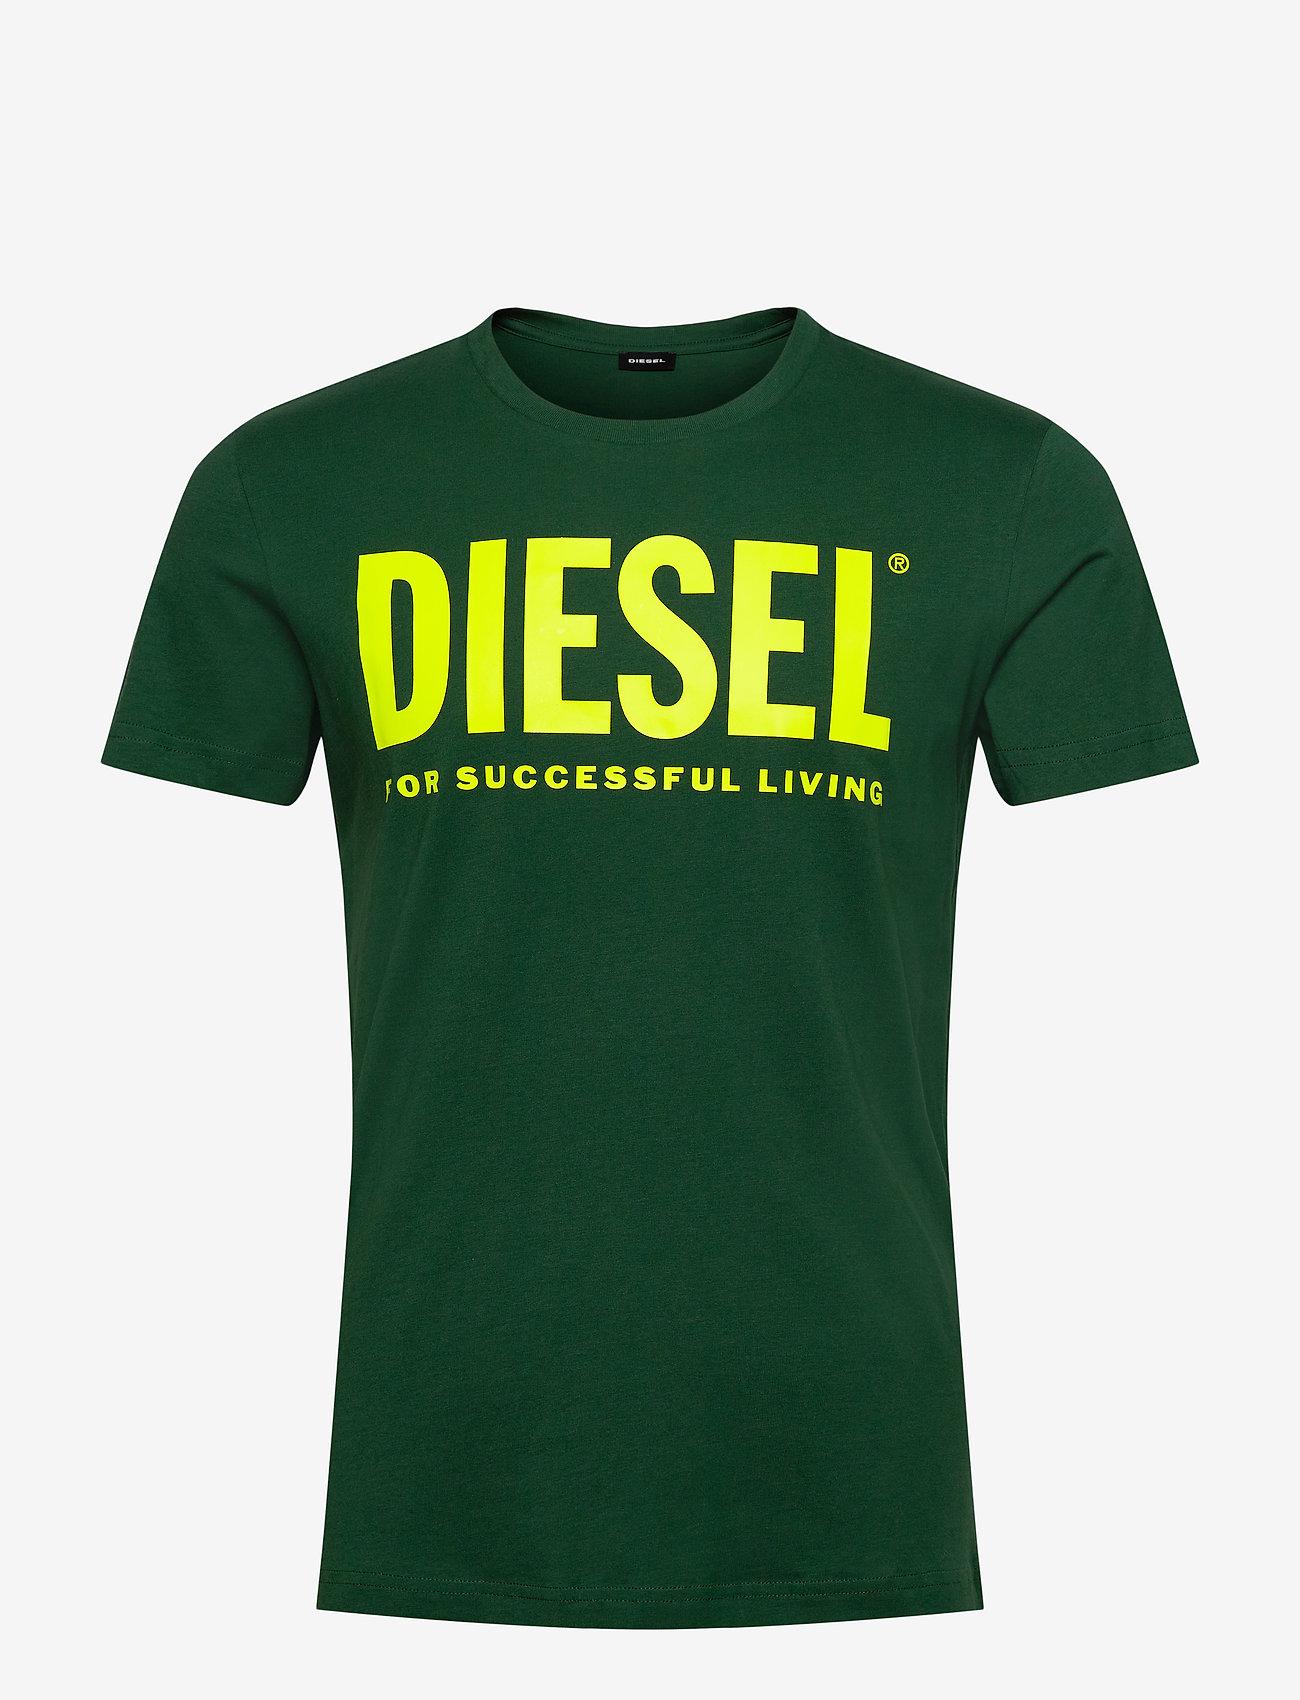 Diesel Men - T-DIEGO-LOGO T-SHIRT - short-sleeved t-shirts - green - 0